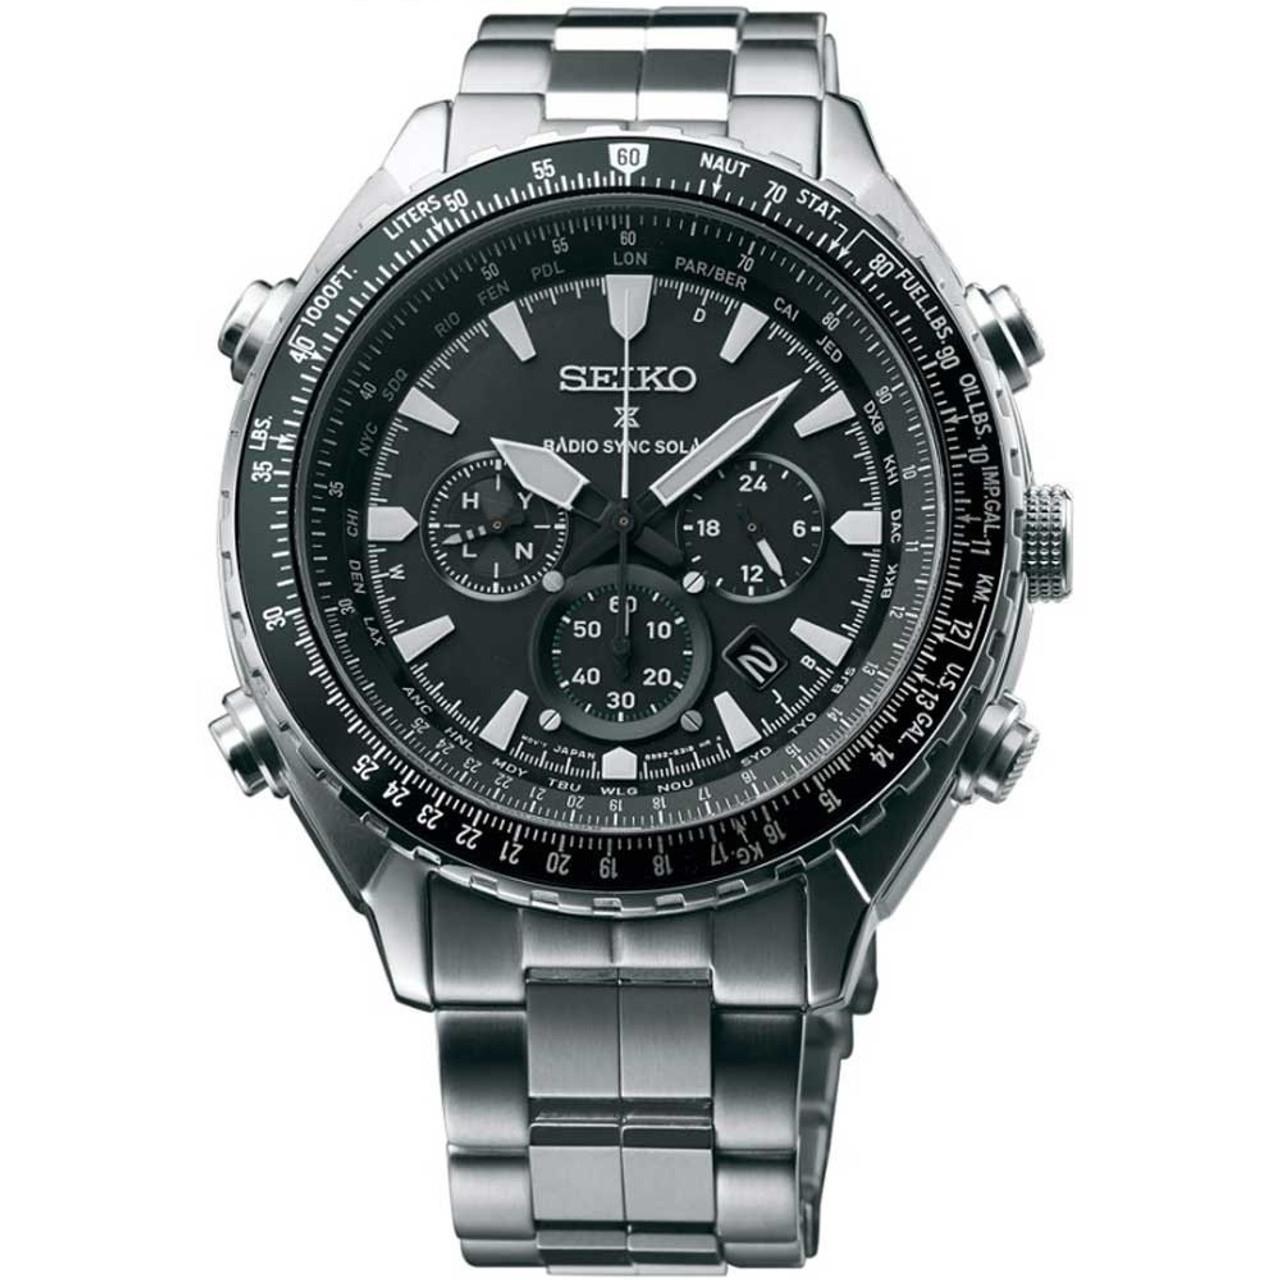 2cddba45c Seiko Mens Radio Controlled Prospex Chronograph Solar Watch SSG001P1